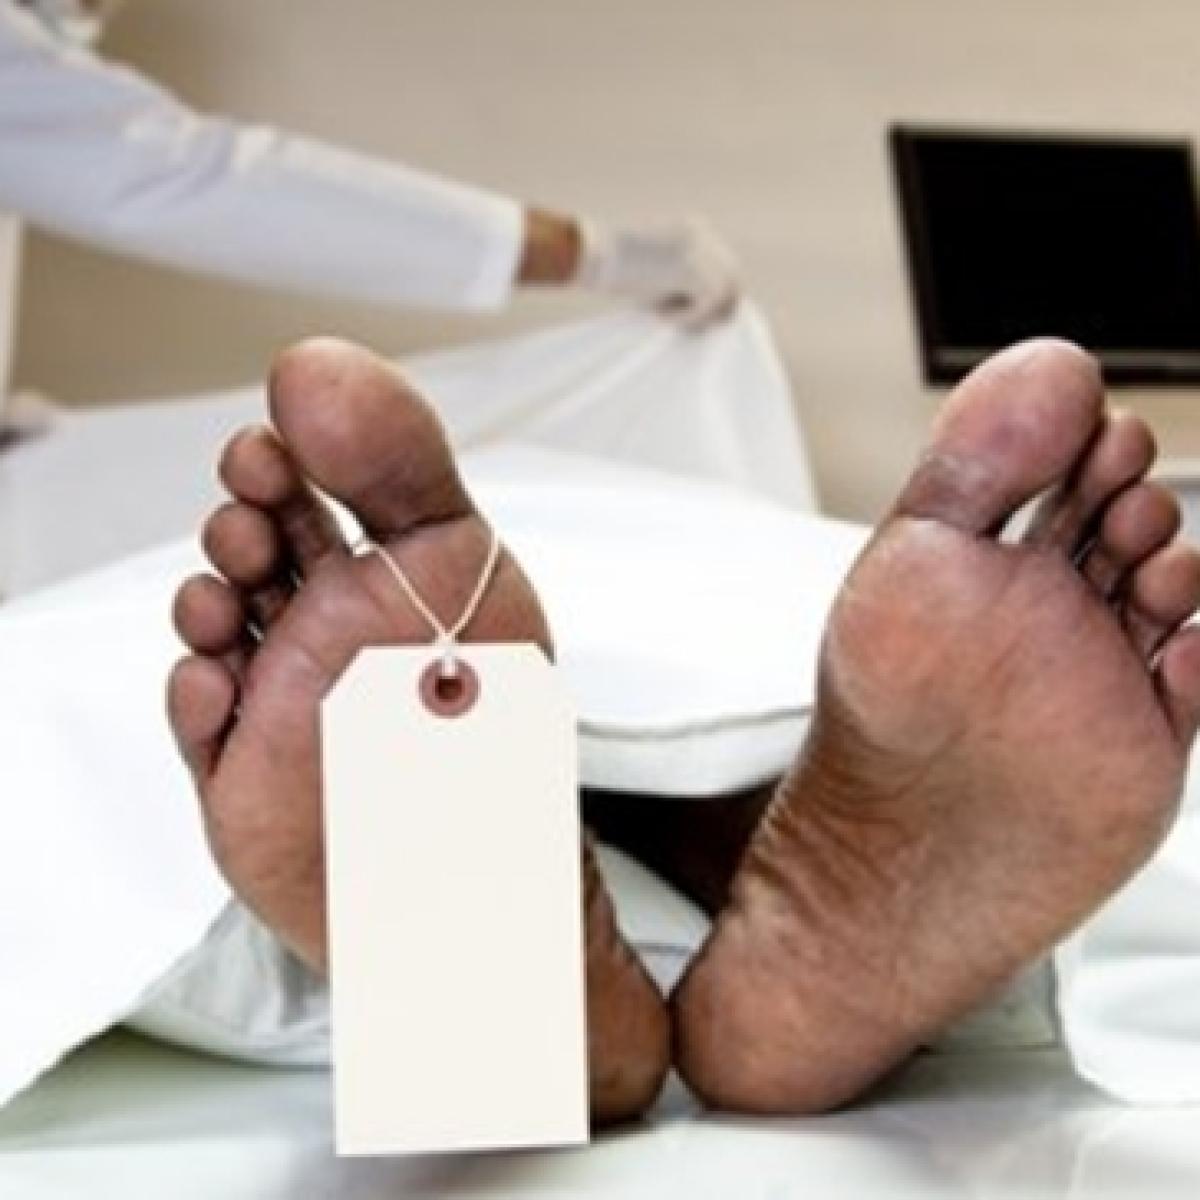 Coronavirus in Mumbai: Body of female employee deployed on COVID-19 duty at St George Hospital found inside a lift